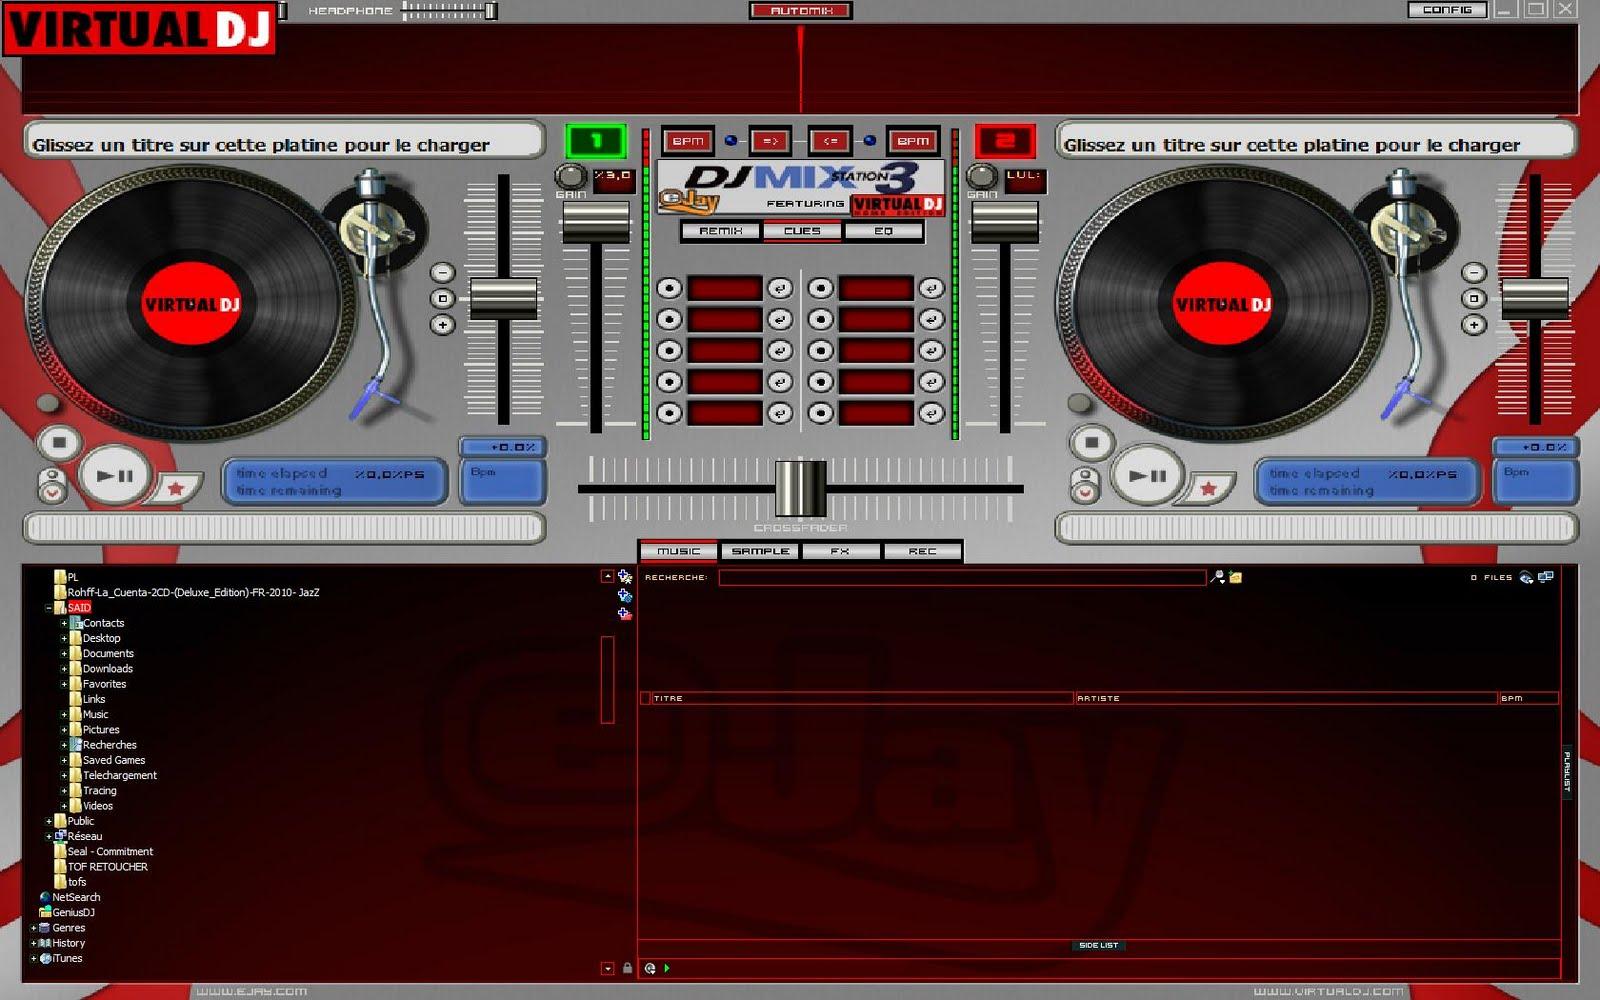 Dj mix station 3 software